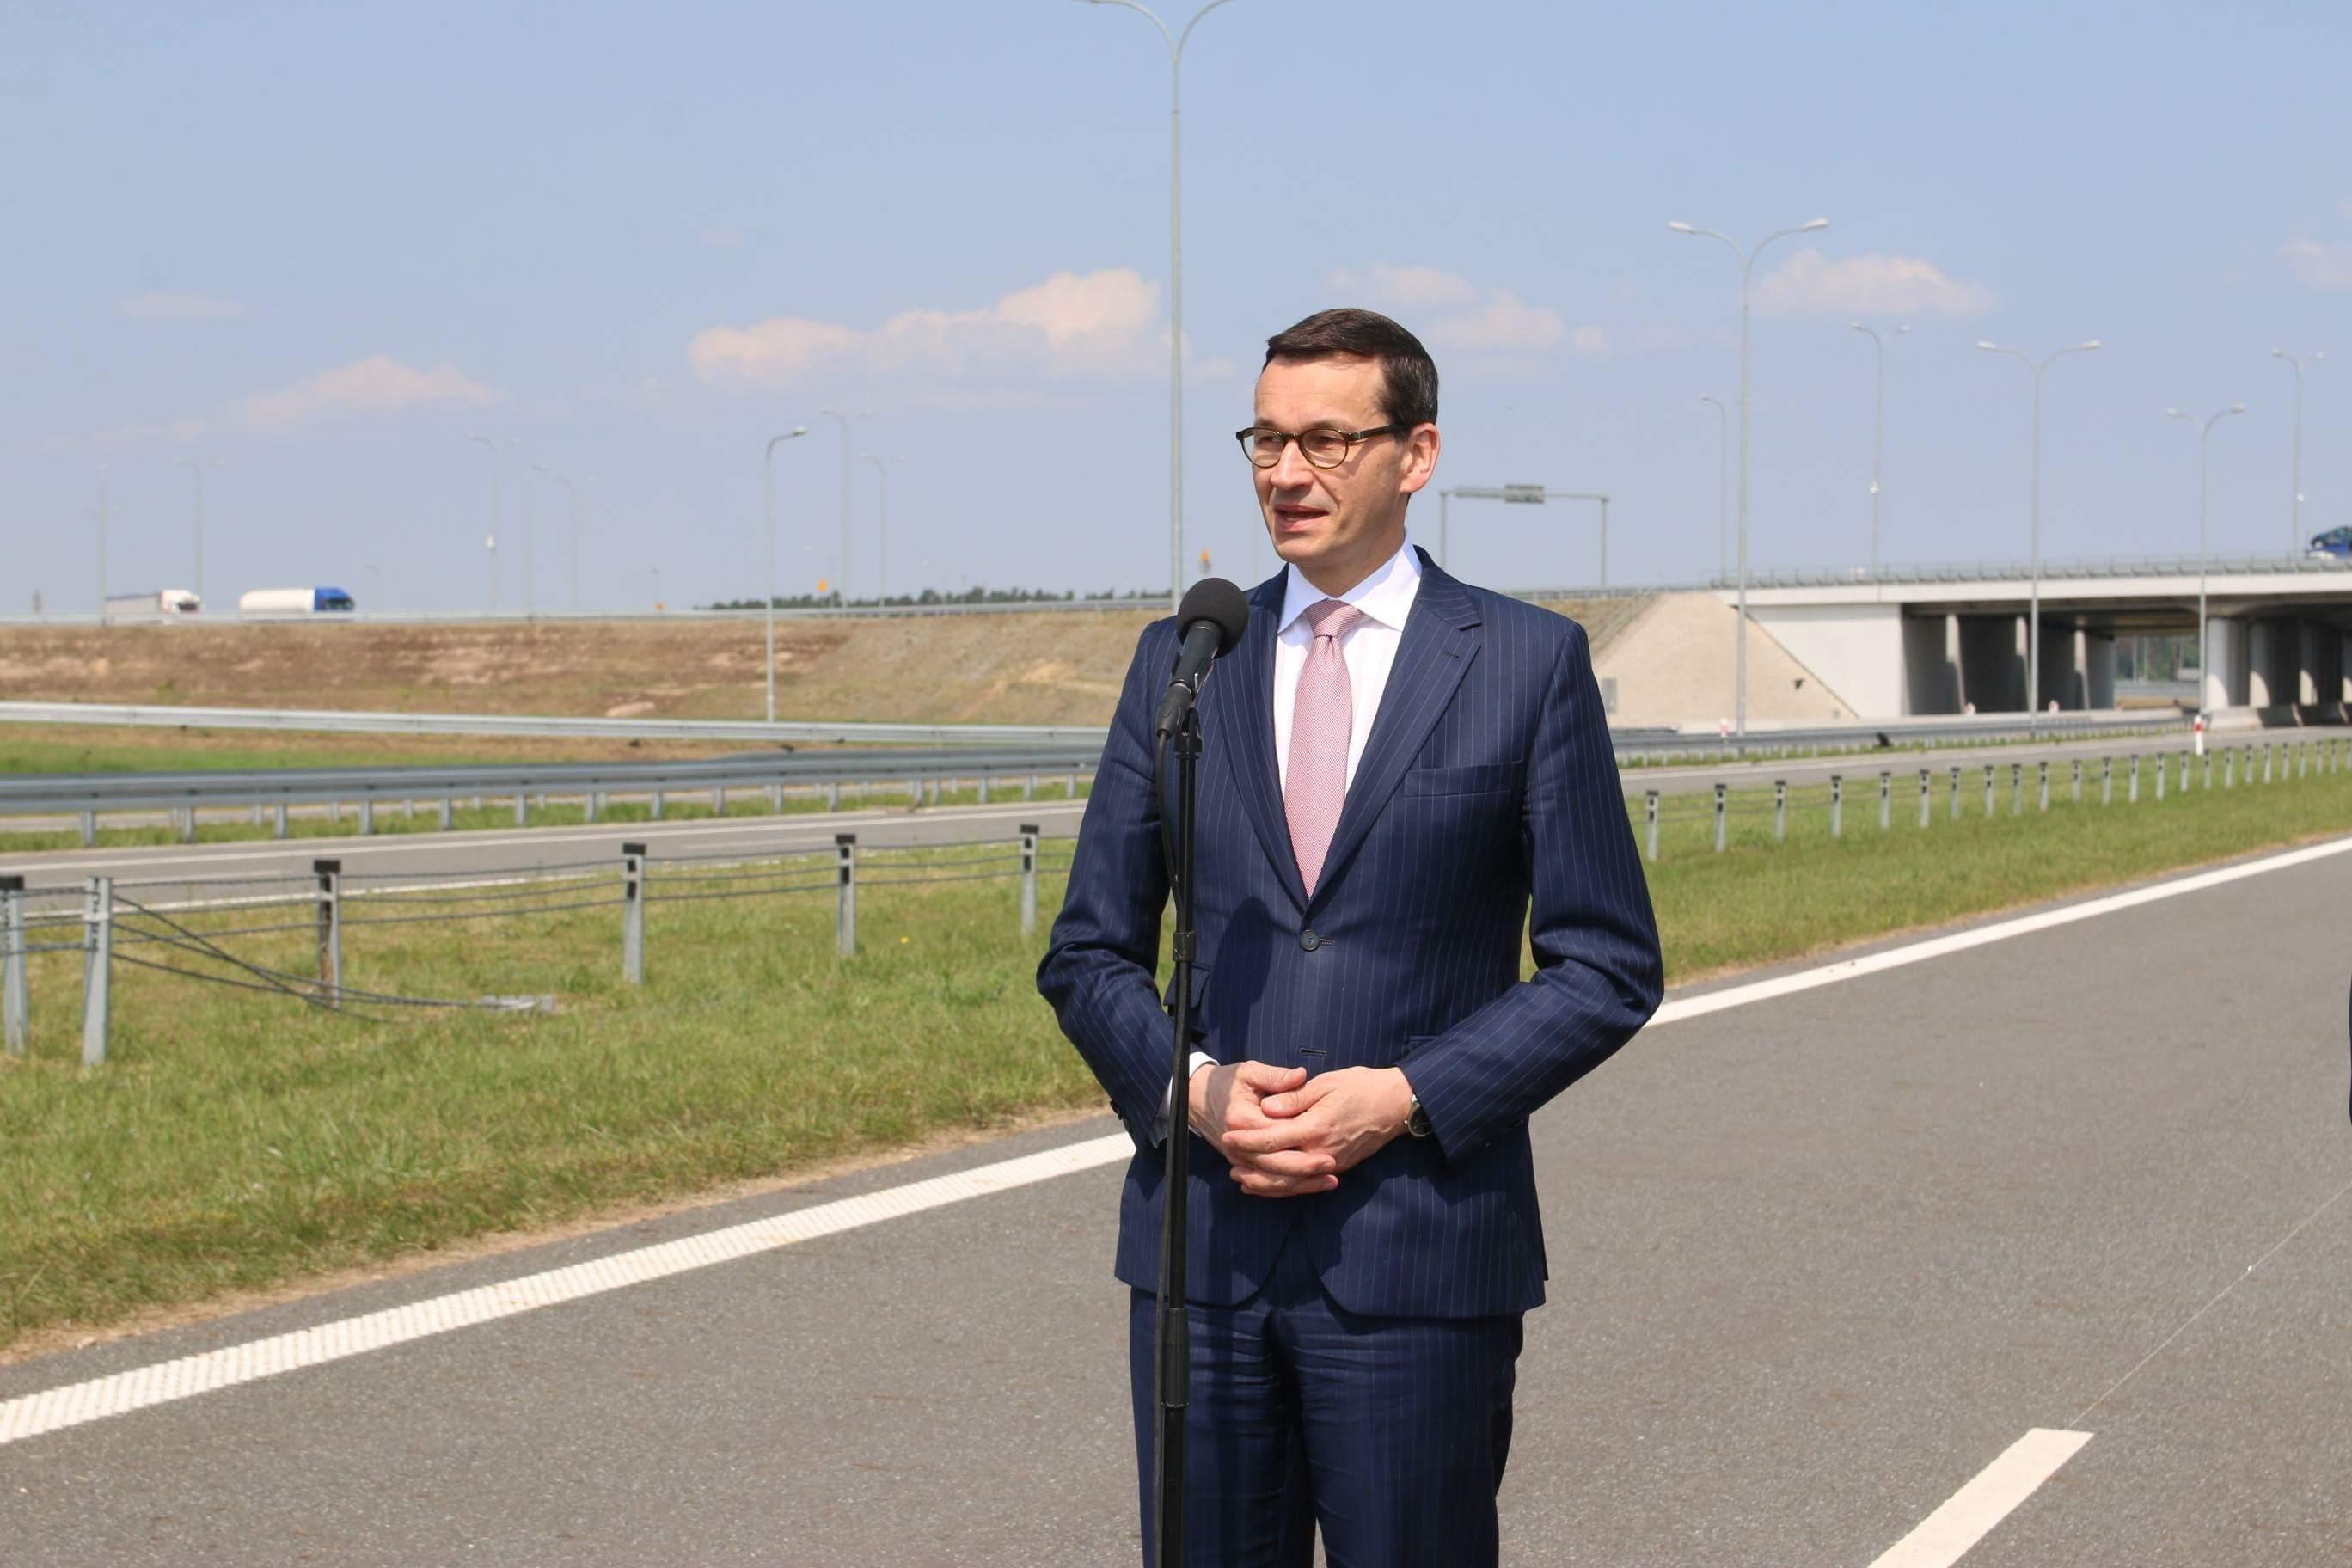 Morawiecki Kępno obwodnica - Kacper Witt